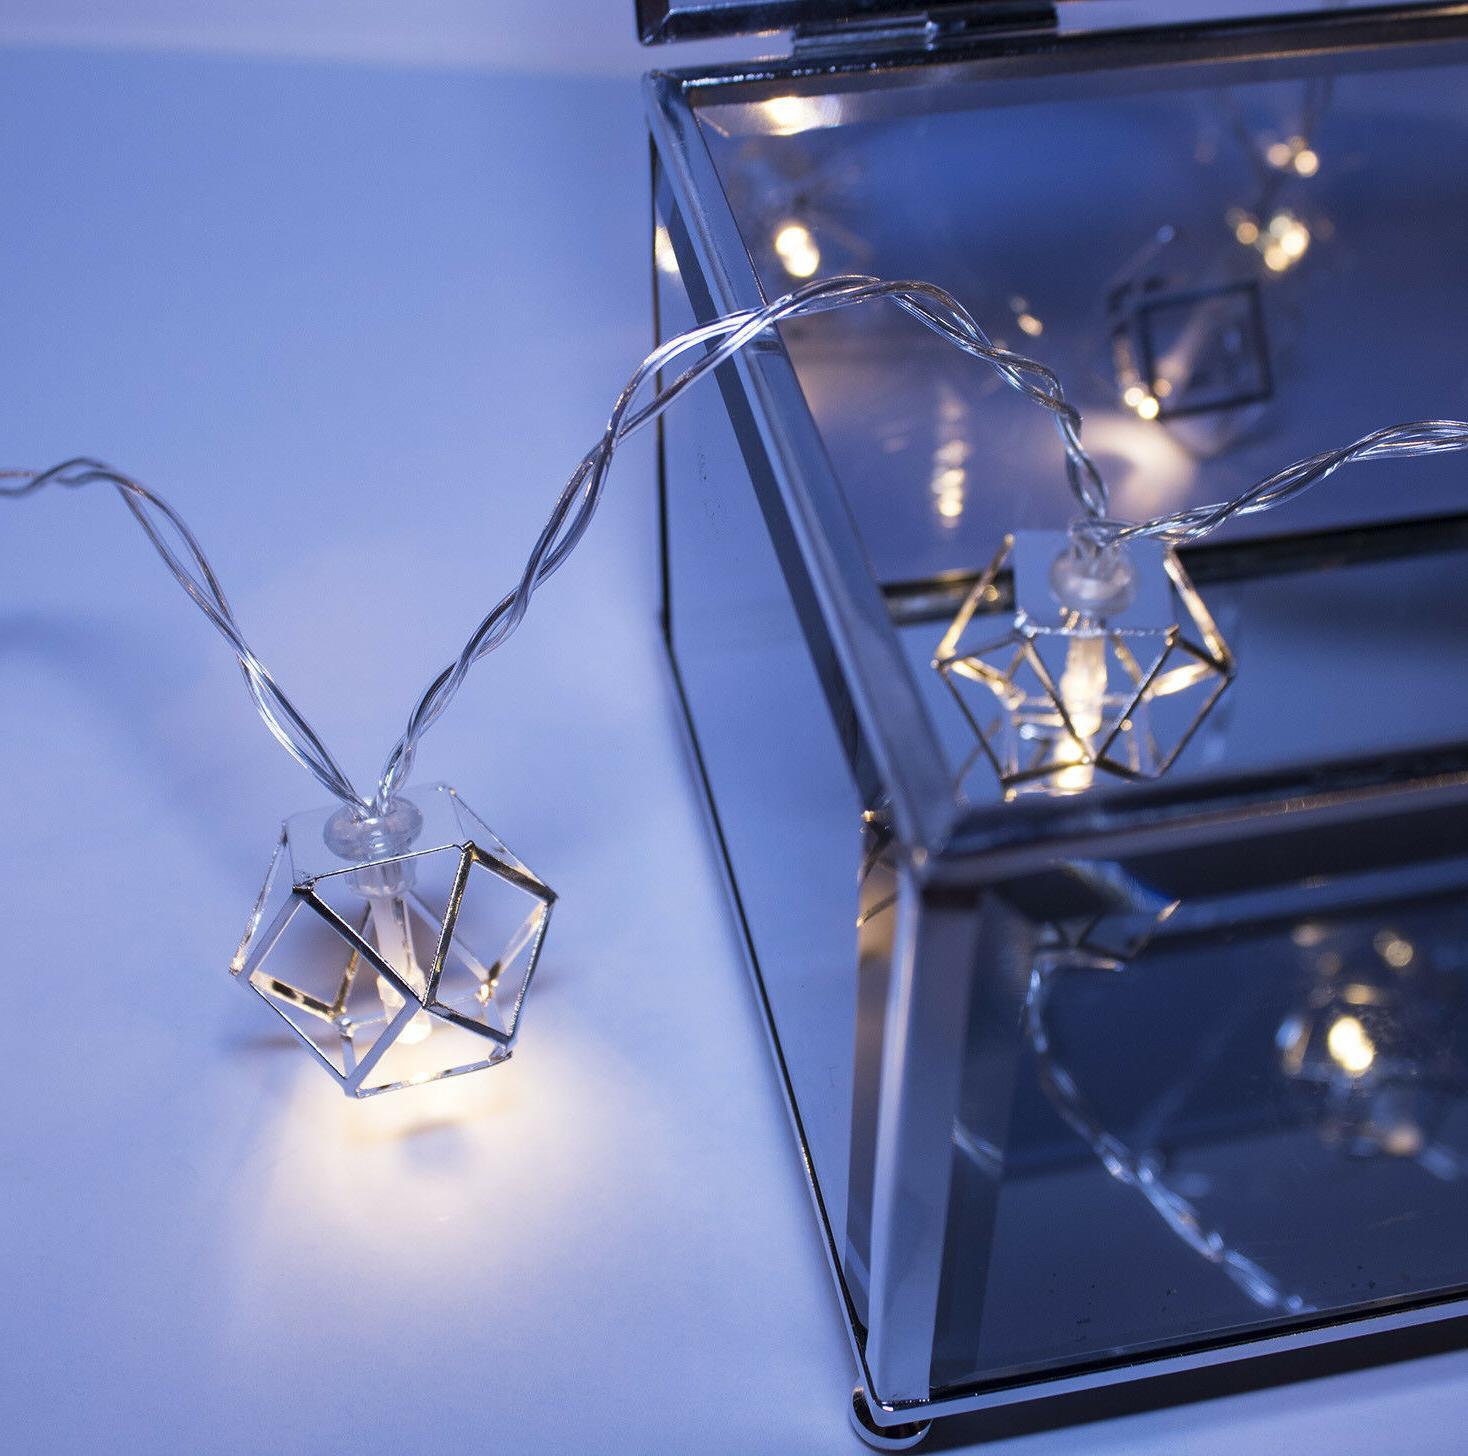 Silver Pendant String Lights 20 LED Home Dorm